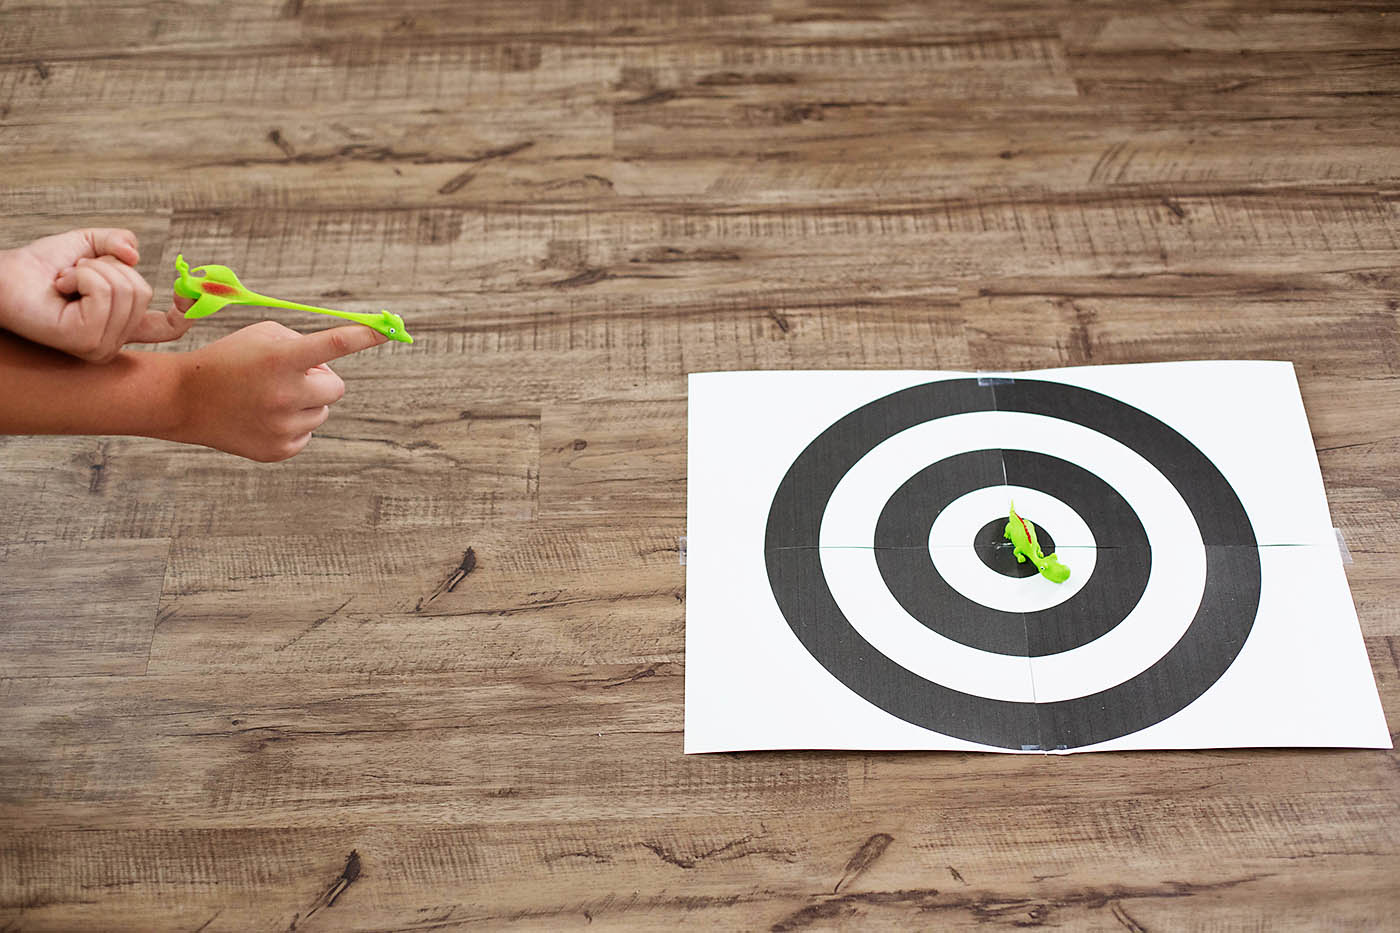 aftb-easy-toy-target-game-5